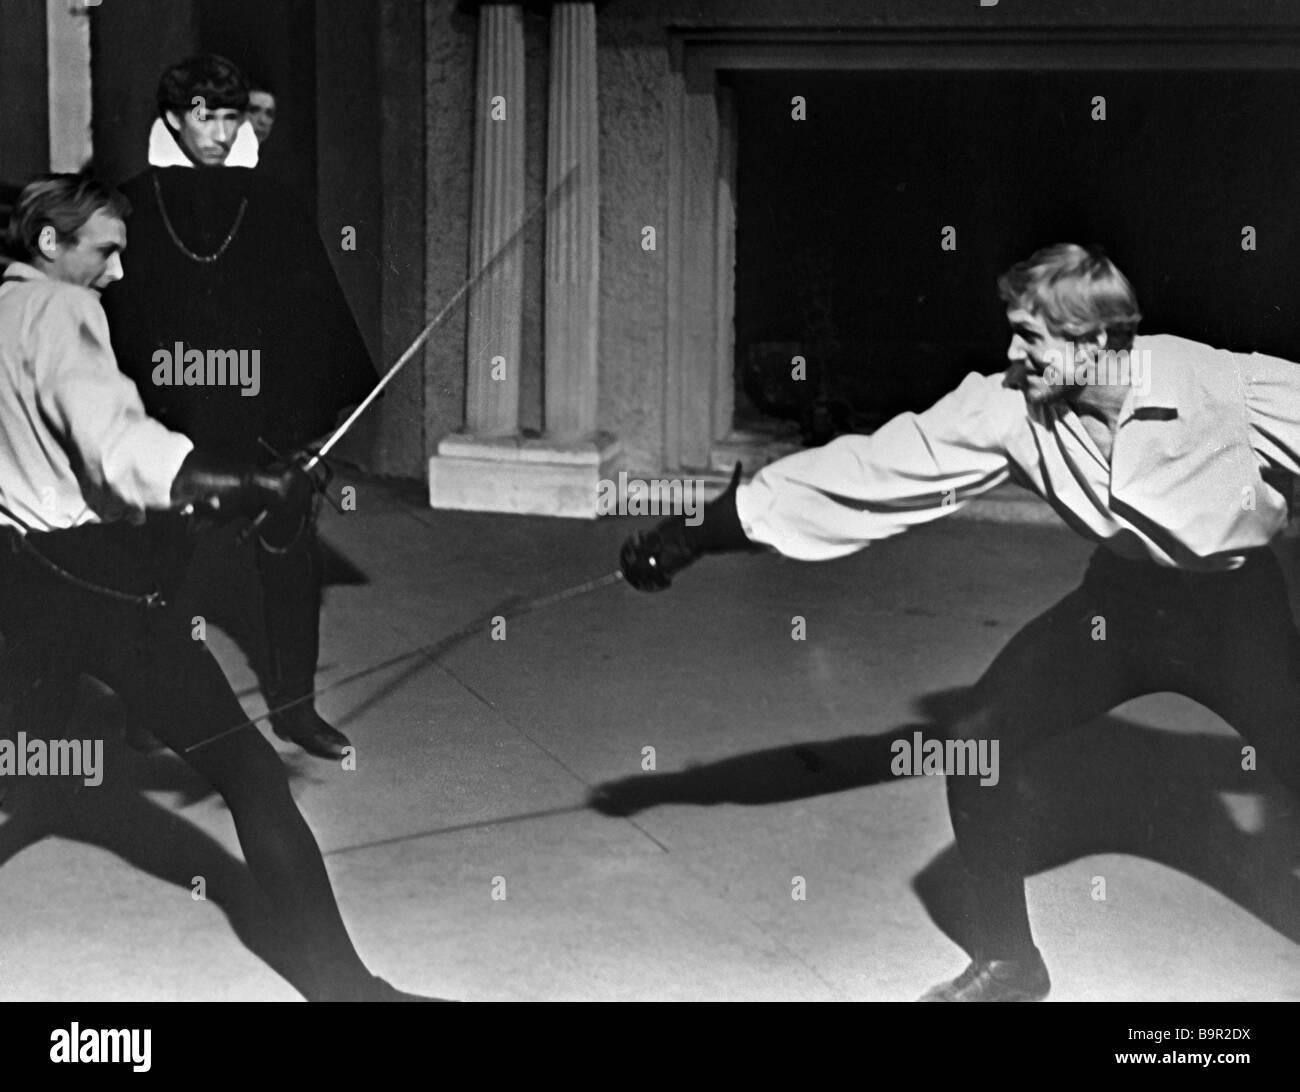 Innokenty Smoktunovsky as Hamlet left and Stepan Oleksenko as Laertes right in film Hamlet by Grigory Kozintsev - Stock Image